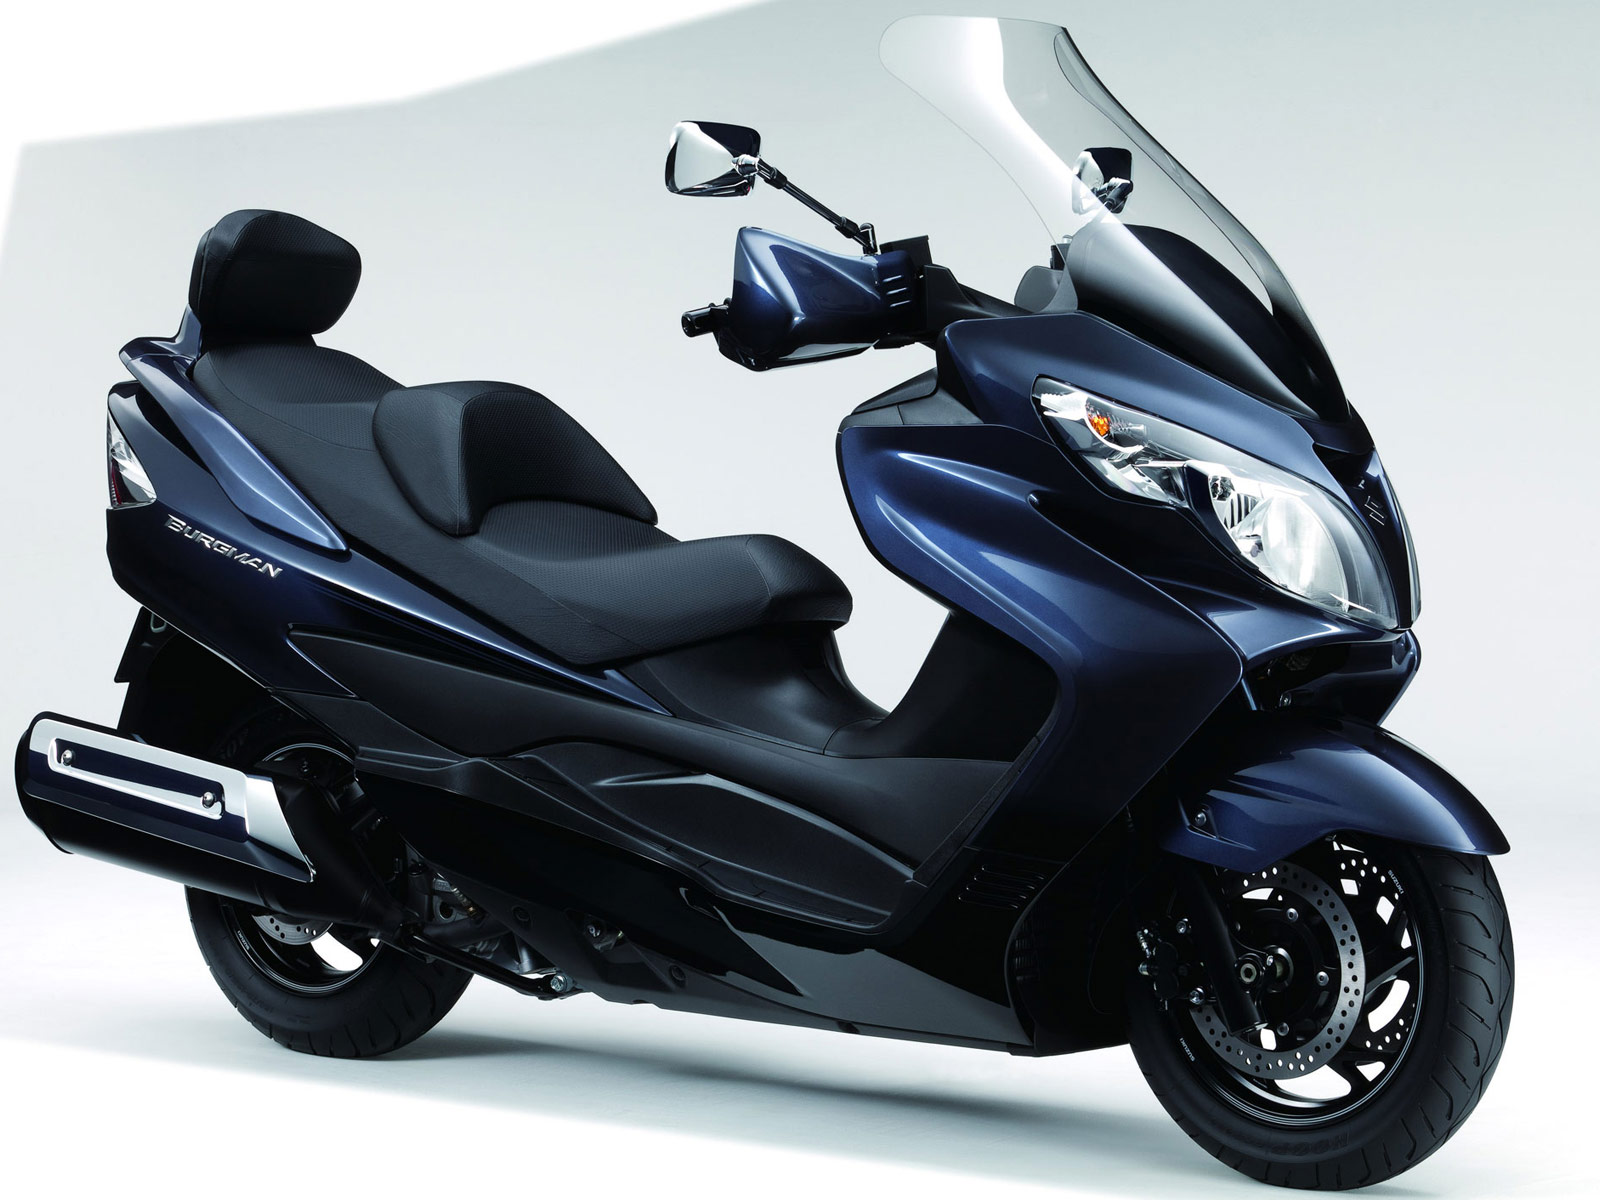 2012 suzuki burgman 400 abs motorcycles insurance. Black Bedroom Furniture Sets. Home Design Ideas